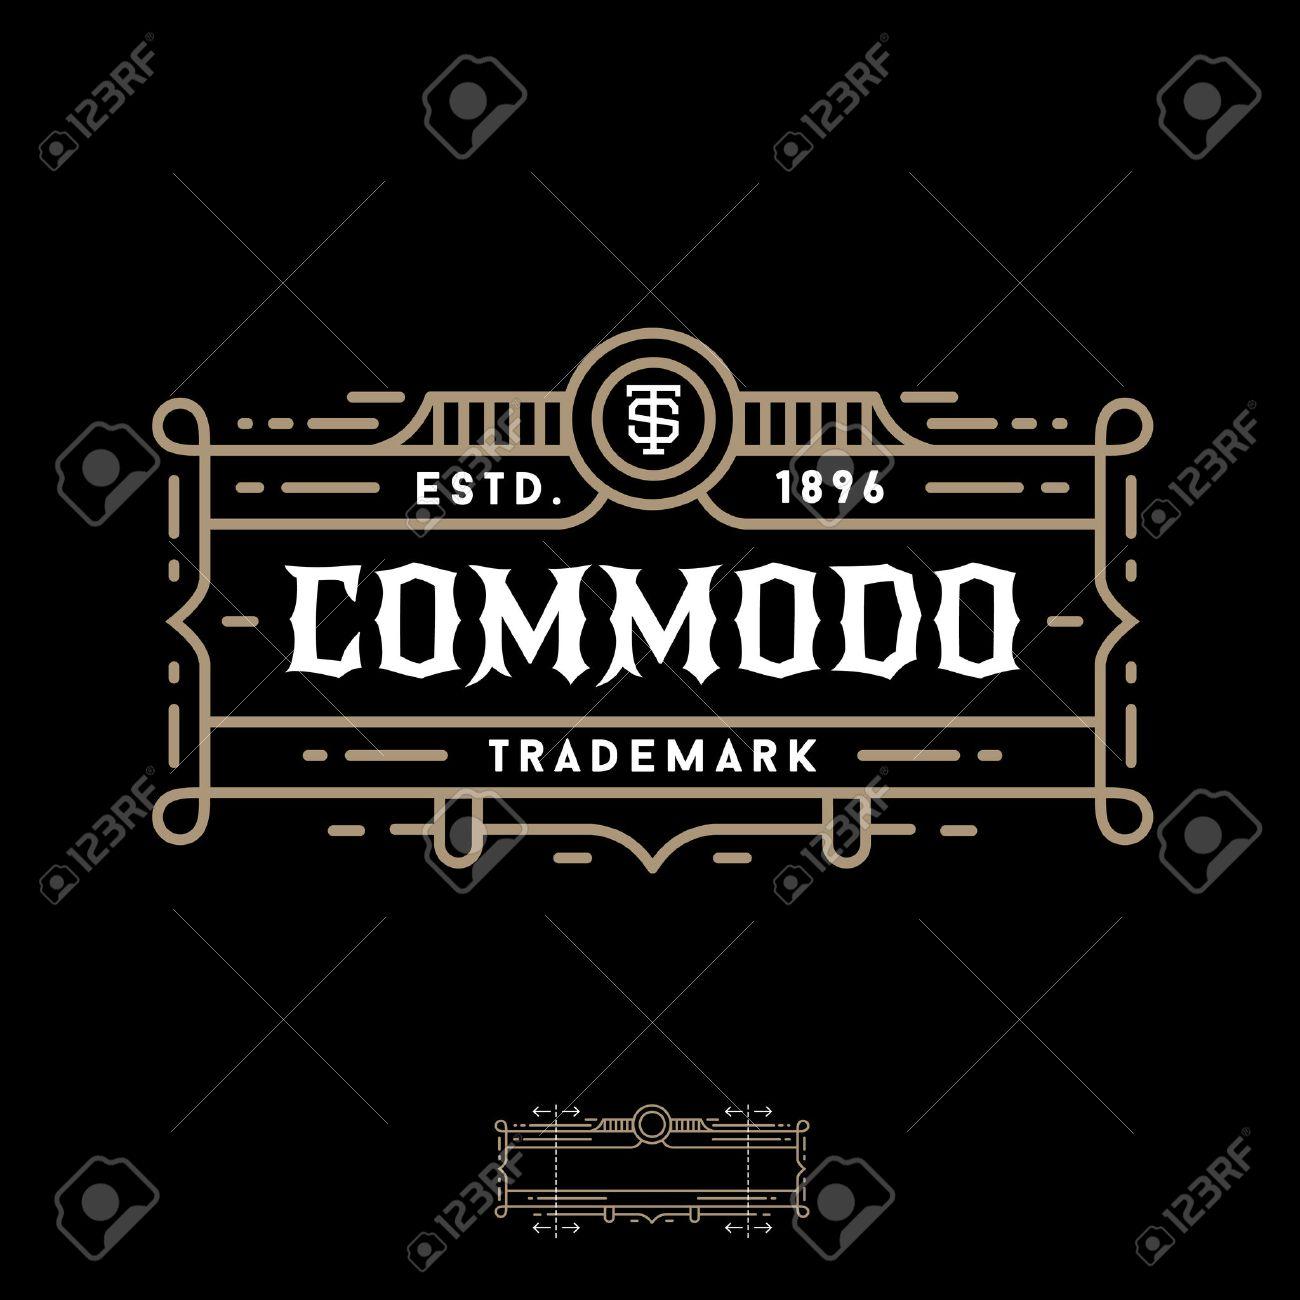 Luxury art deco monochrome  vector hipster minimal geometric vintage linear frame , border , label ,  badge for your logo or crest Stock Vector - 45352403